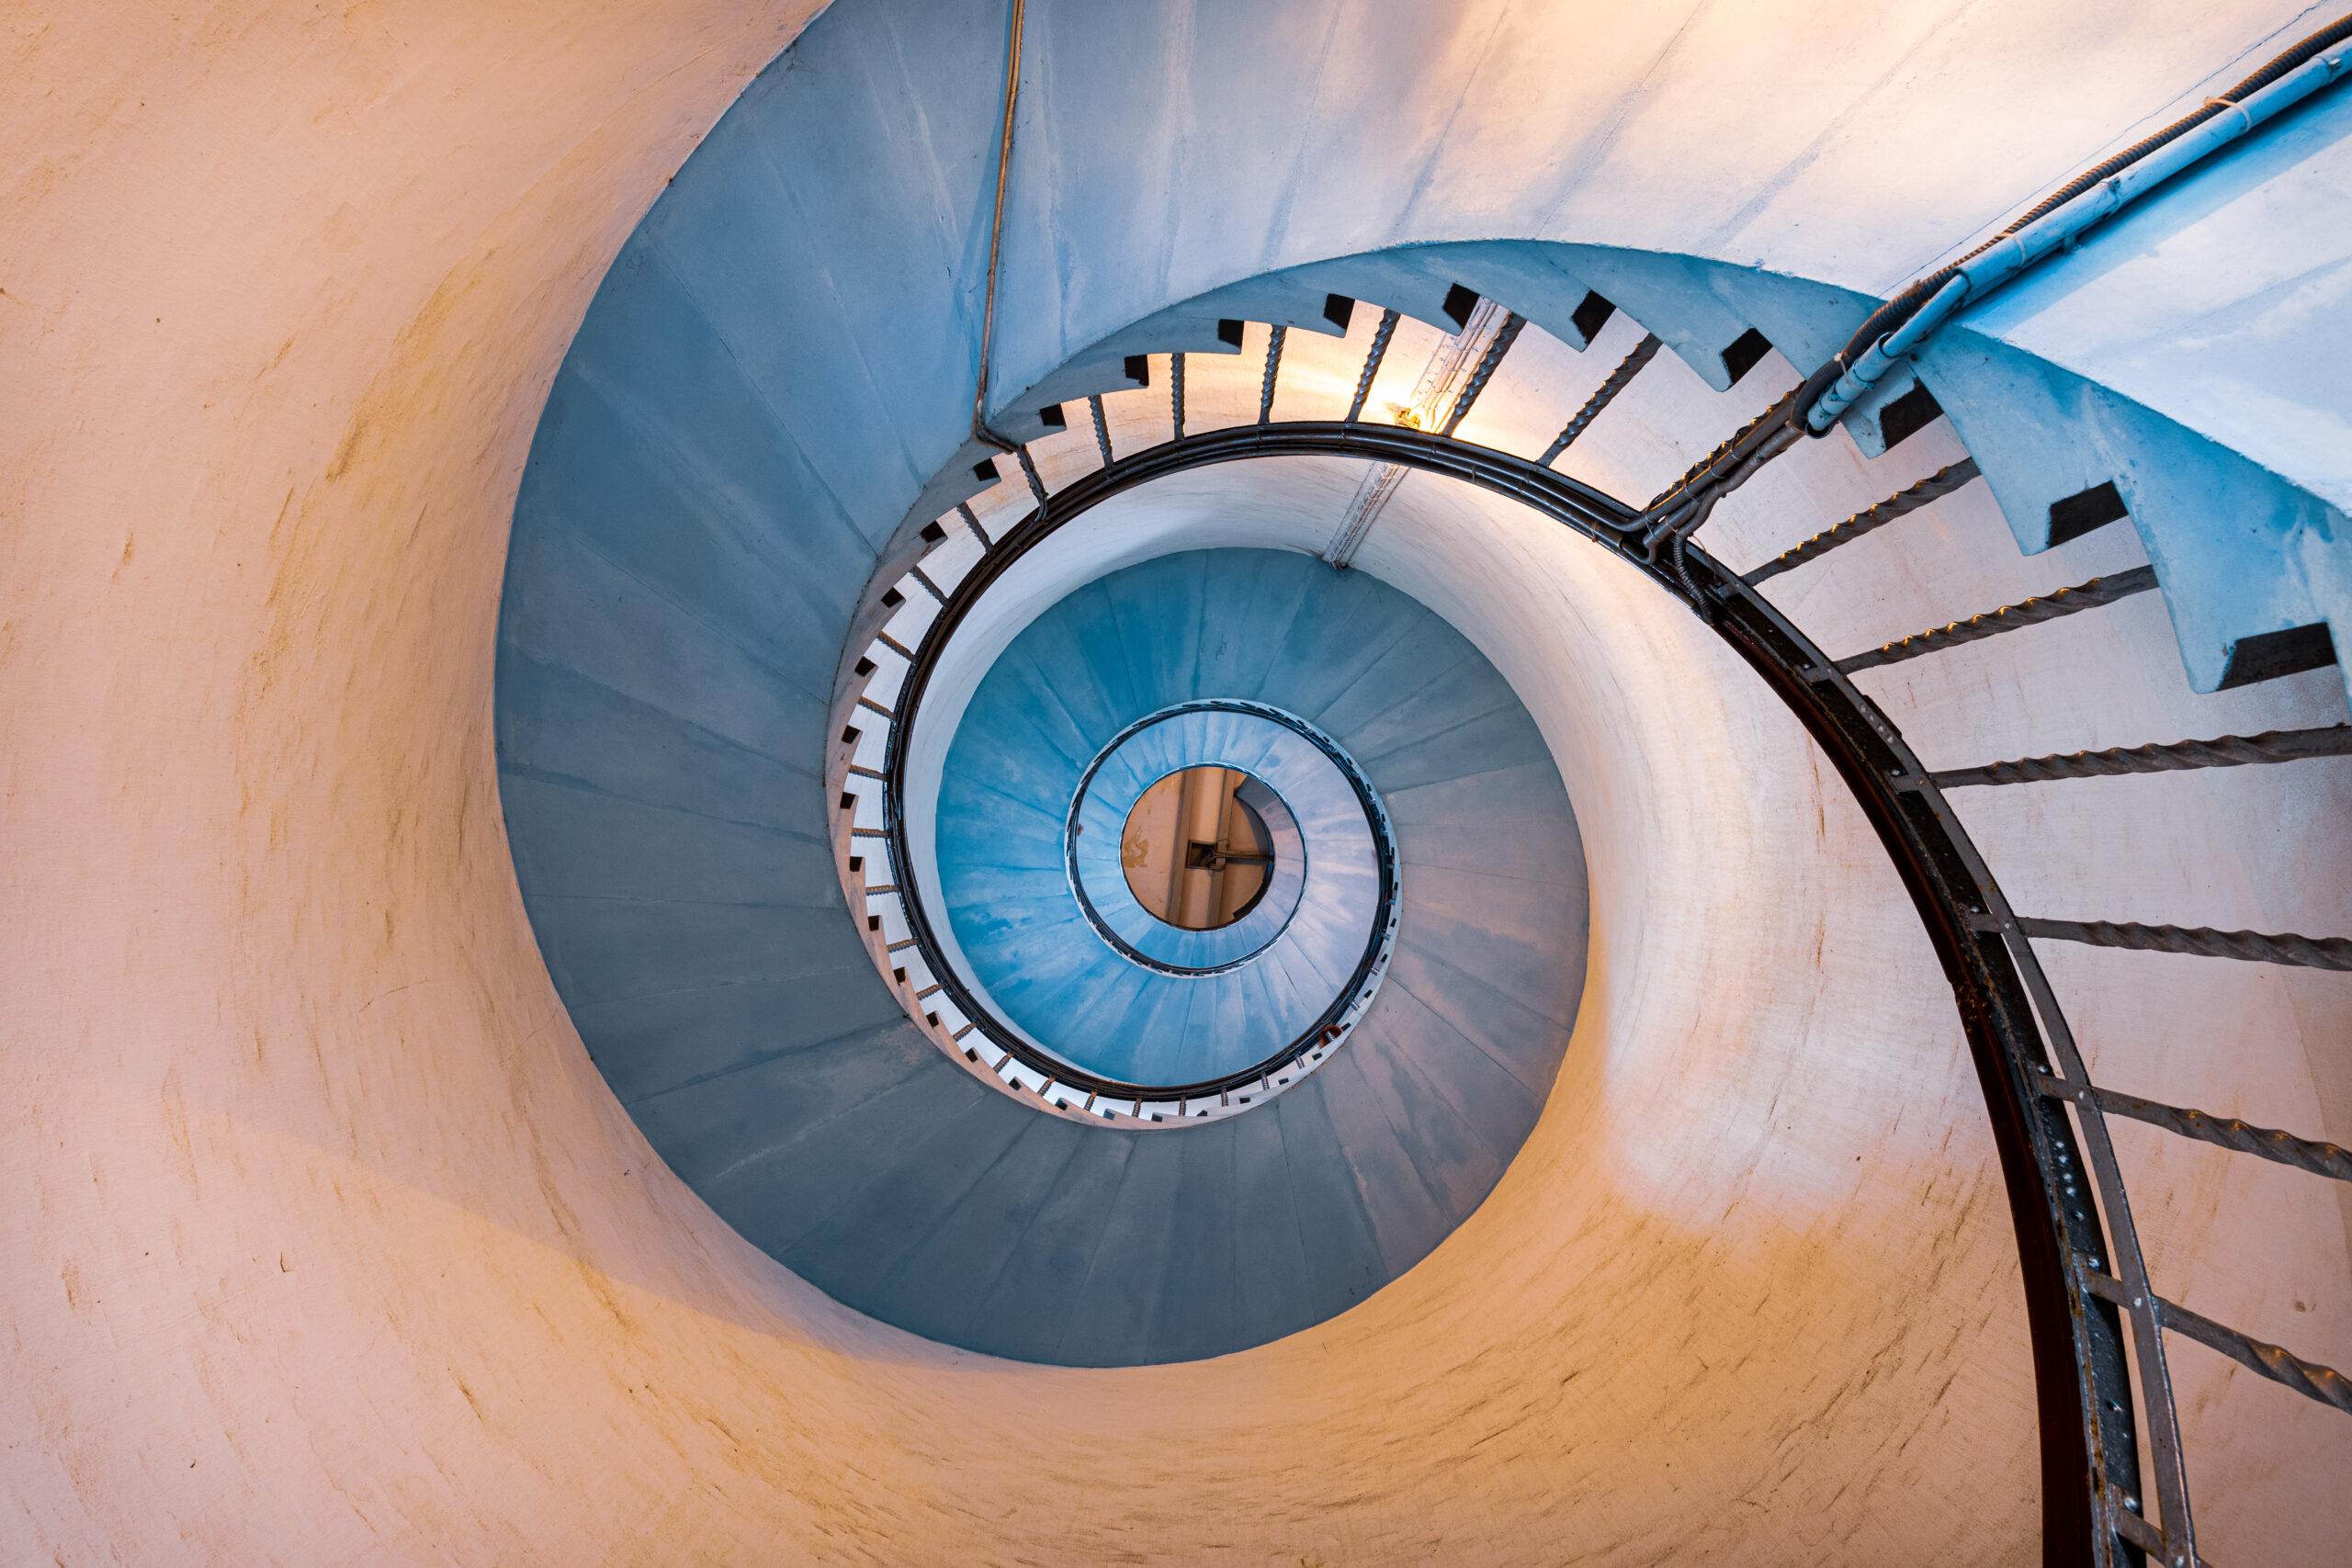 Lighthouse Staircase Lyngvig Fyr -Sigma 18-35mm - 18mm - F8 - 1 Sec - ISO100 - Nikon D500